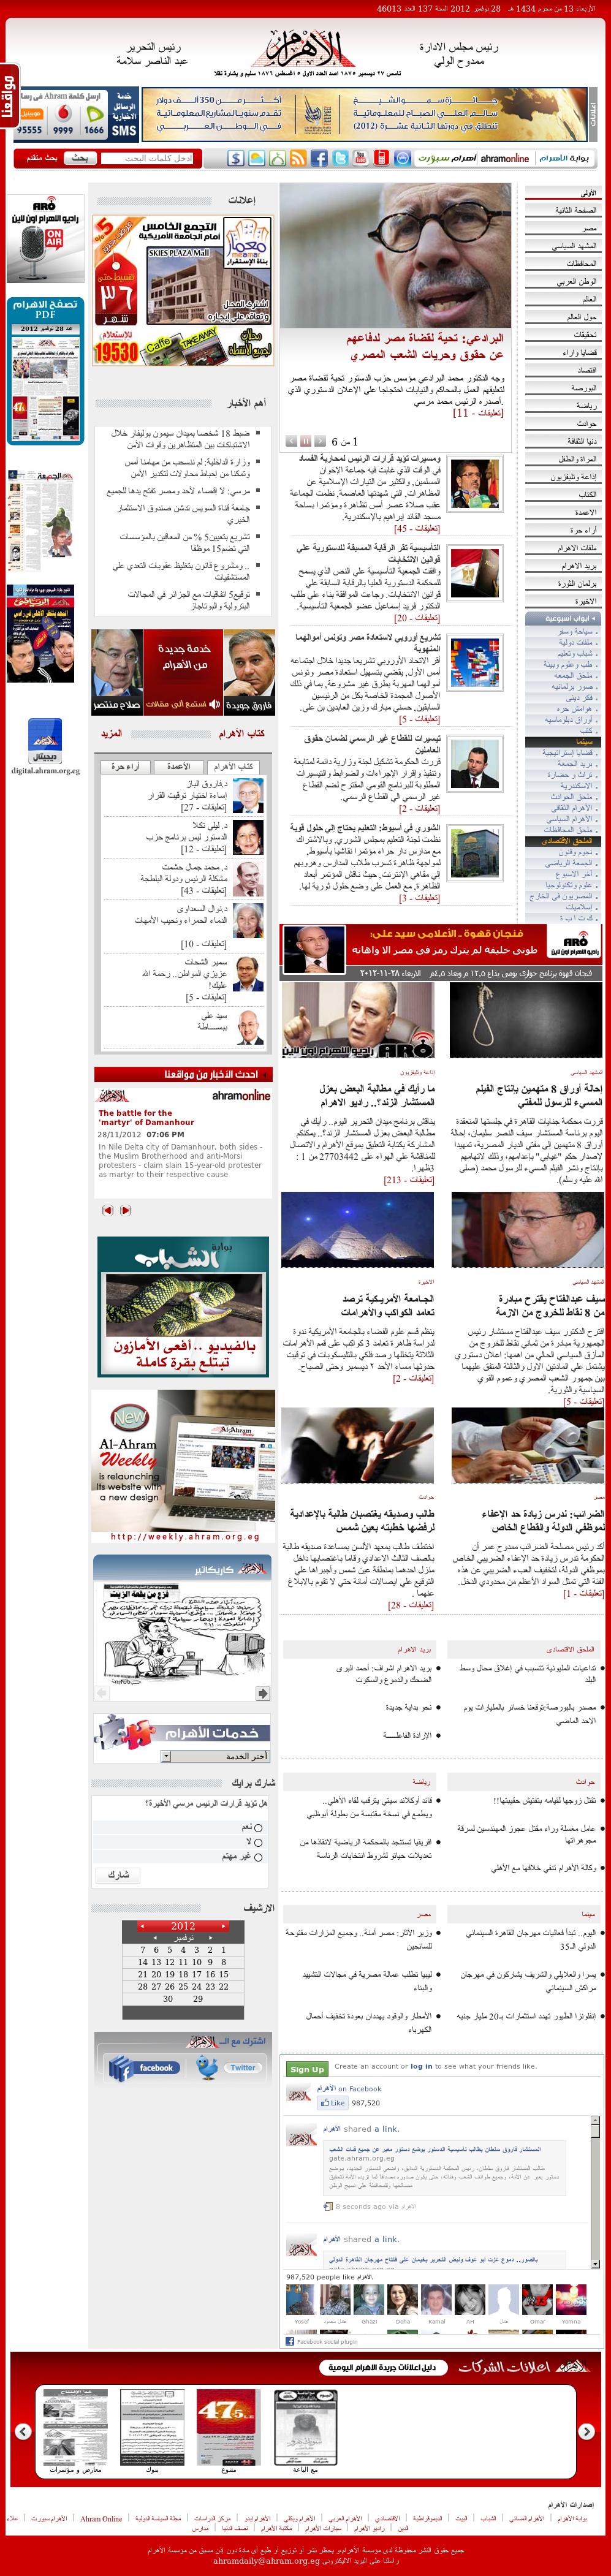 Al-Ahram at Wednesday Nov. 28, 2012, 7 p.m. UTC